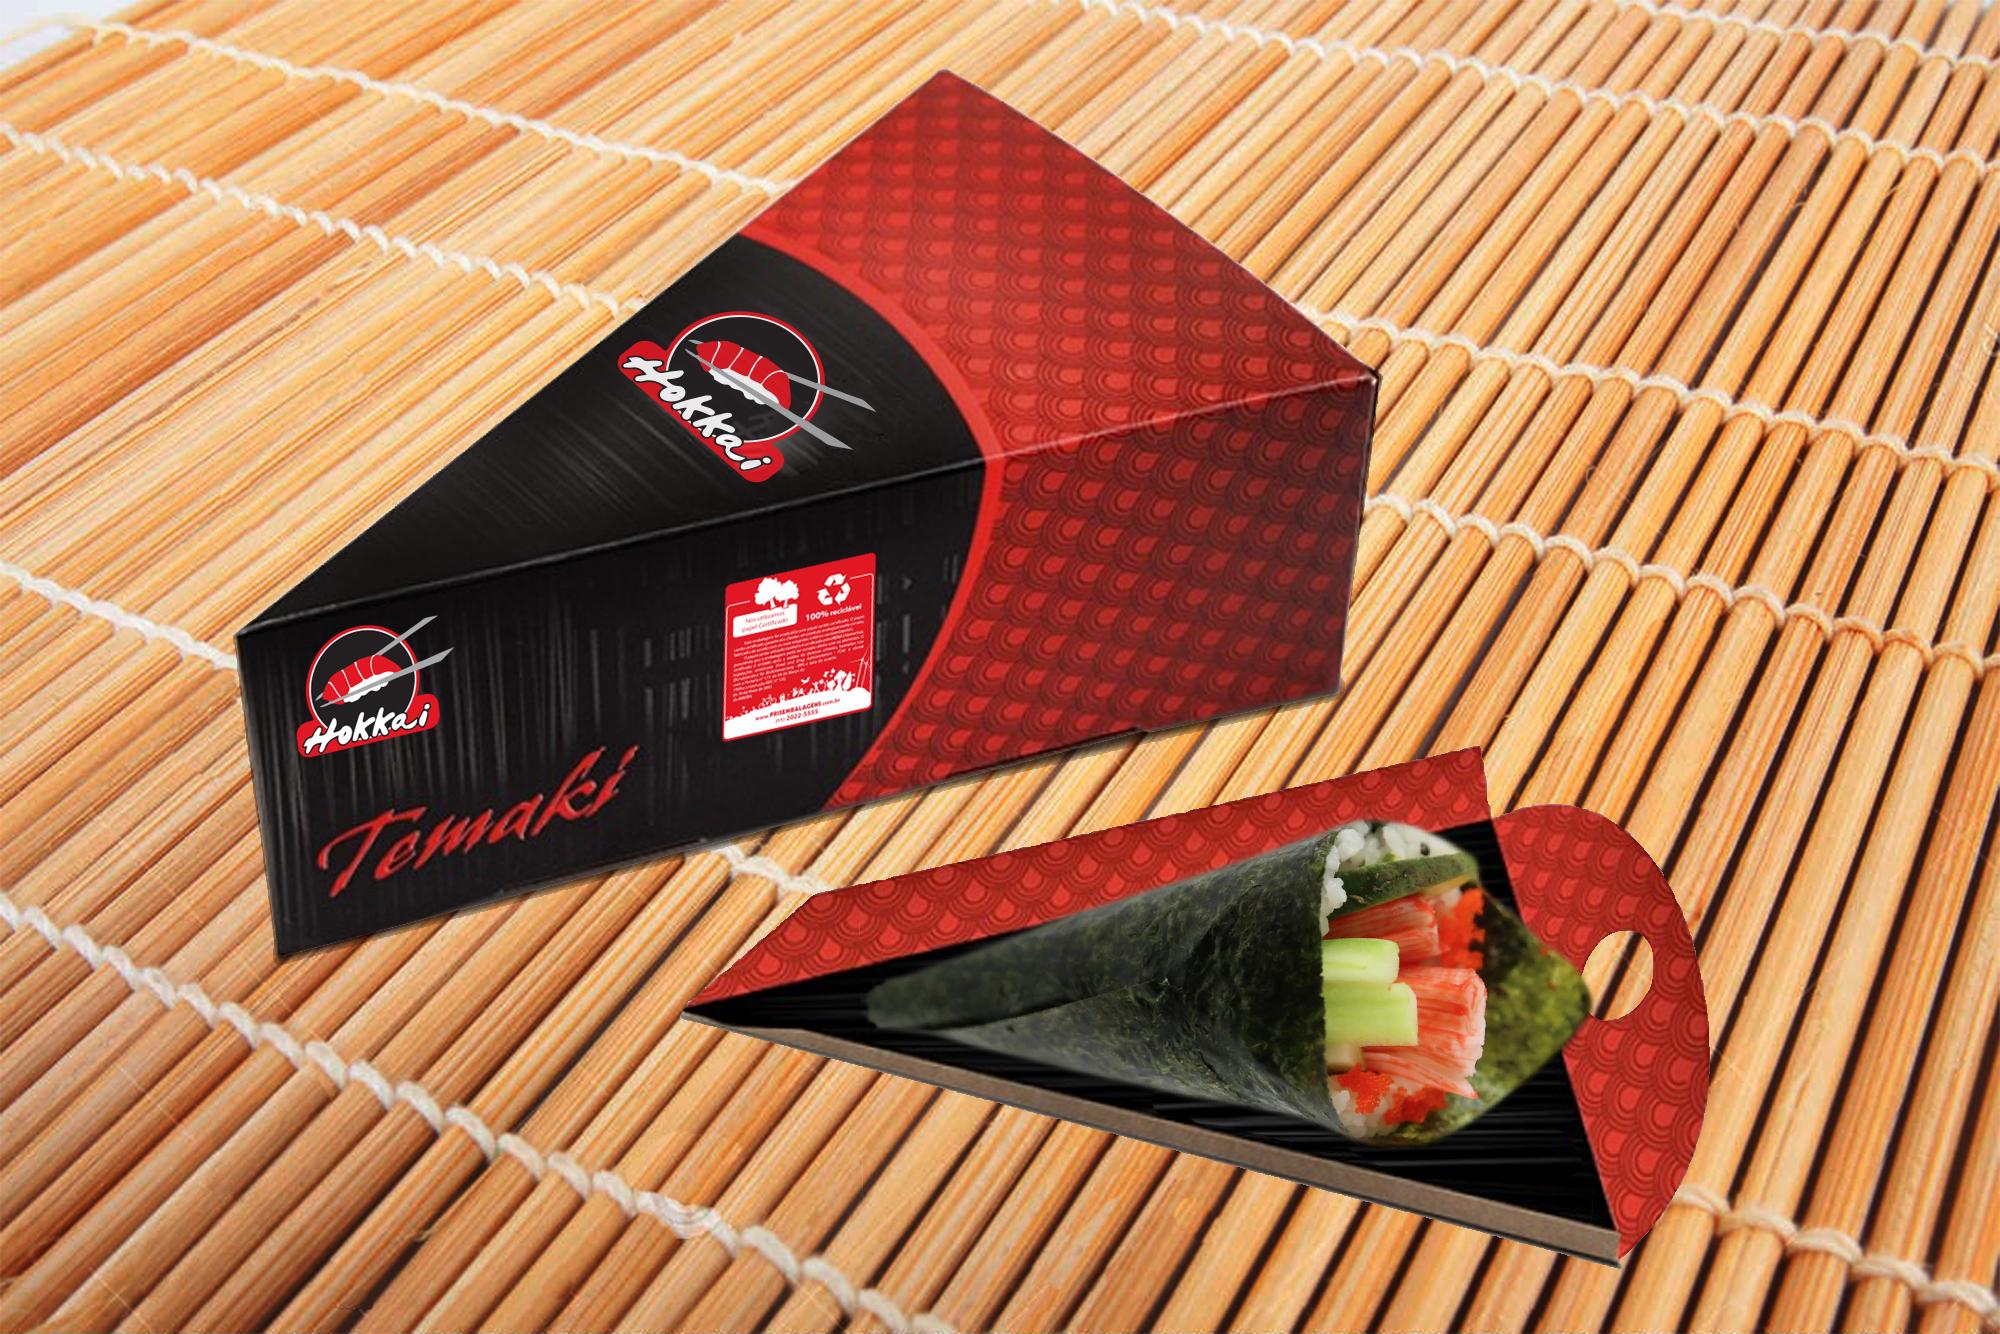 design de embalagem temaki